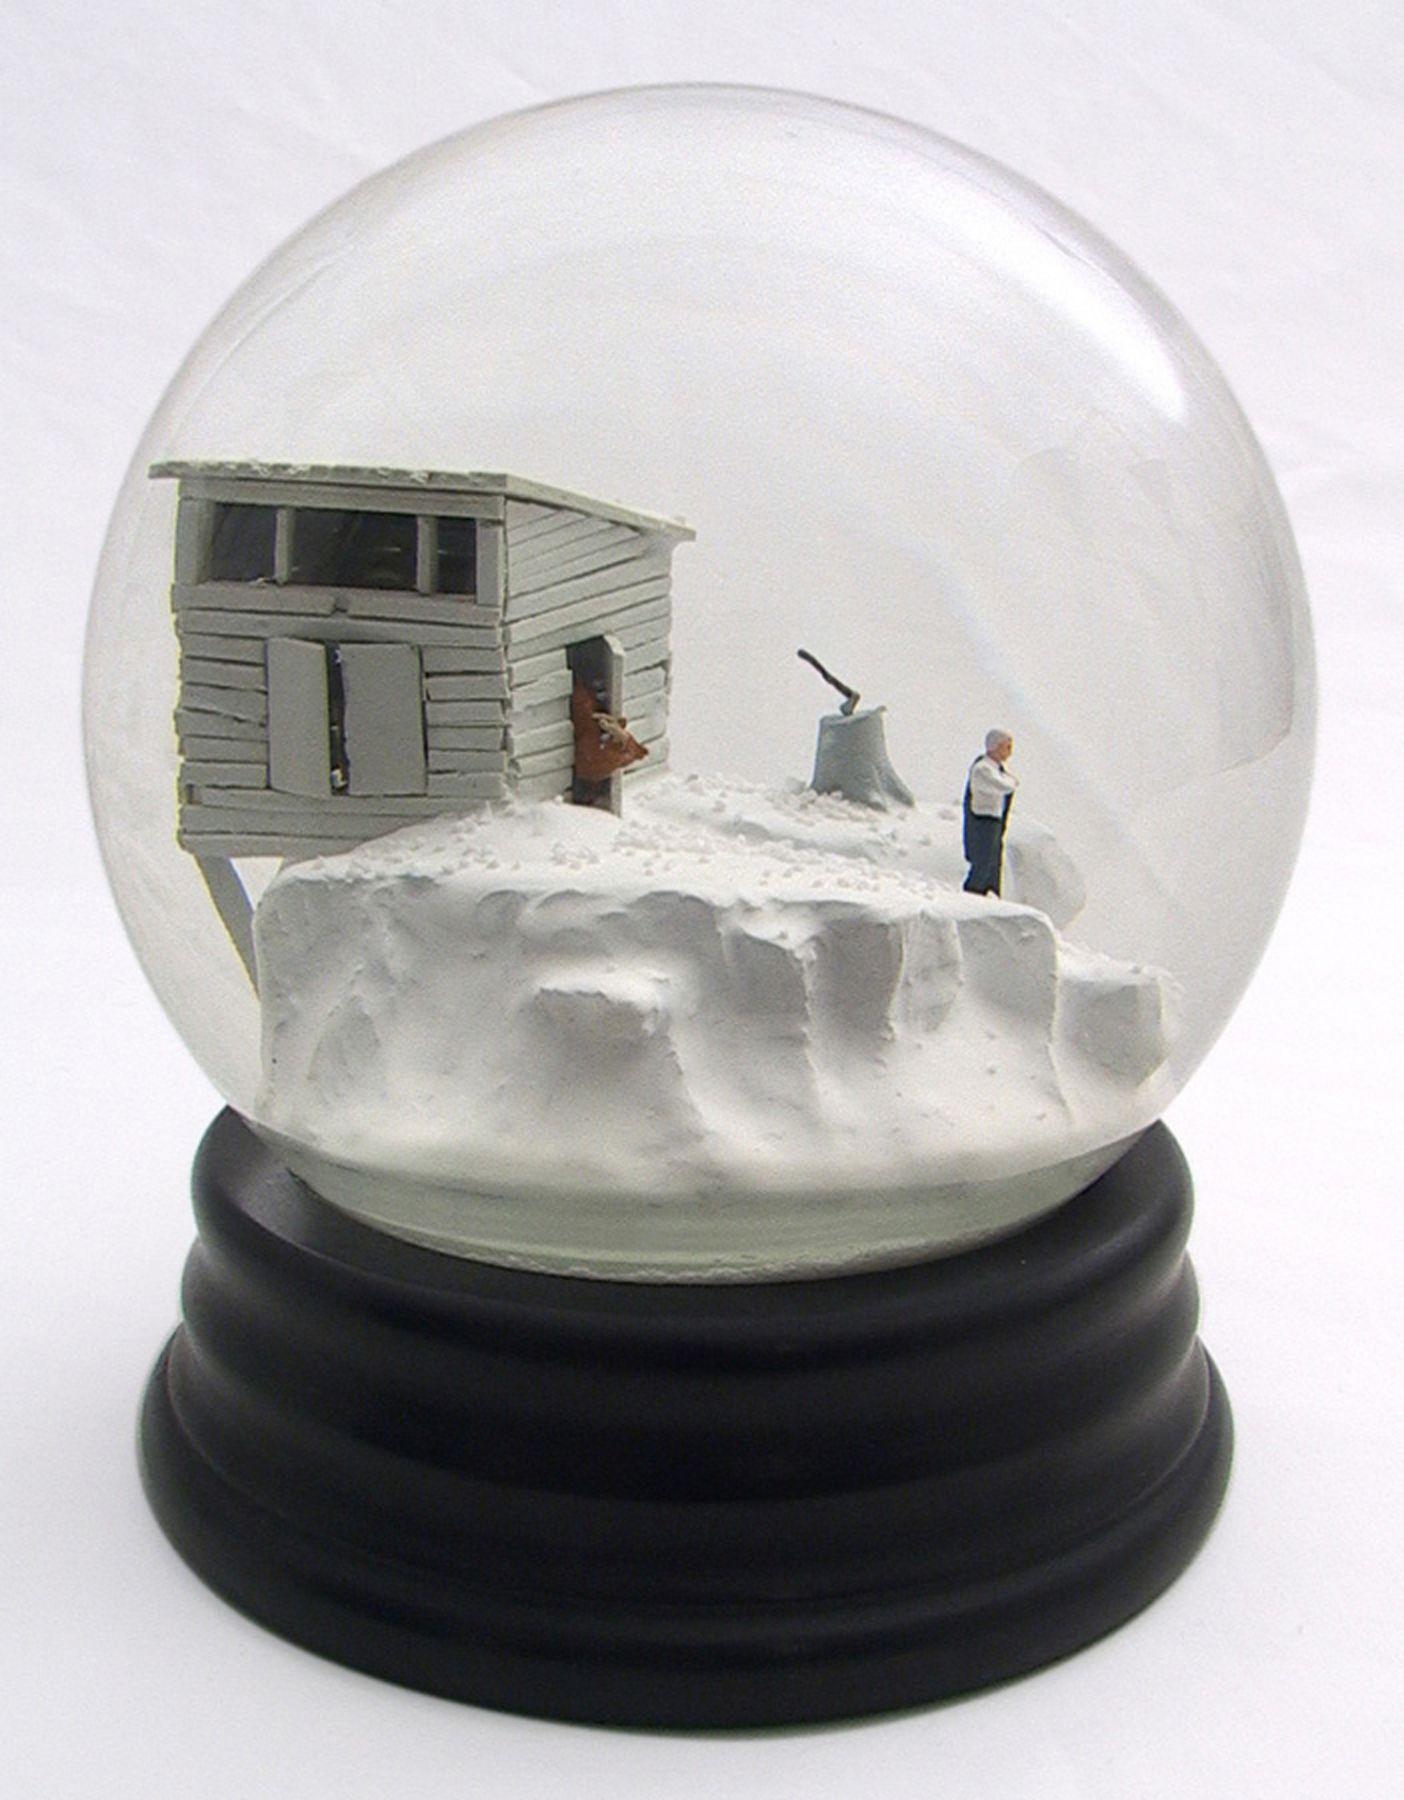 Walter Martin & Paloma Munoz, Traveler CLXXVI (176), 2012, glass, wood, water and plastic, 9 x 6 x 6 inches